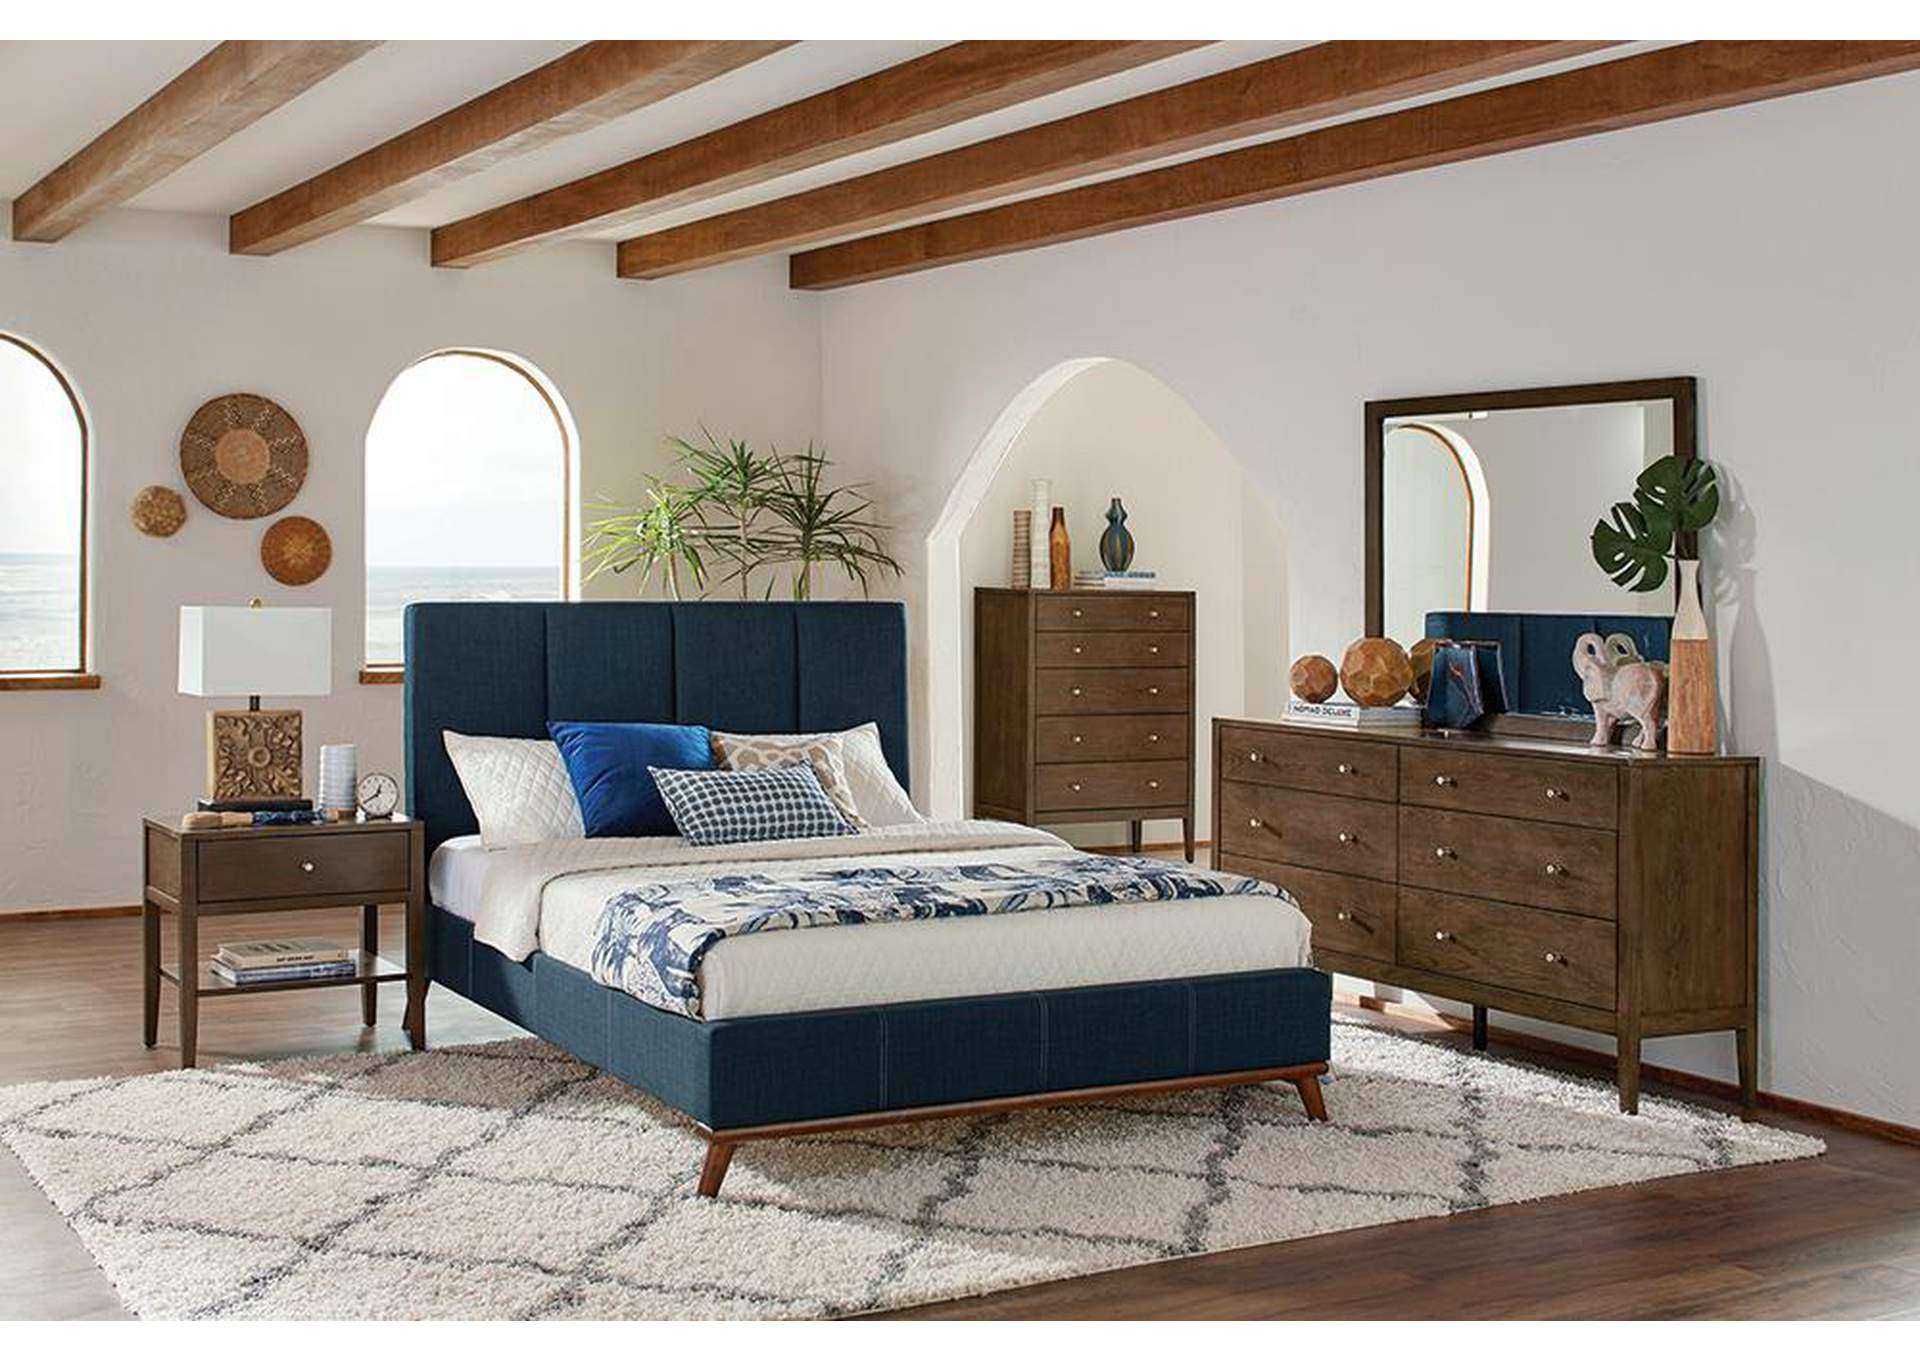 Gray Nickel 4 Piece California King Bedroom Set Best Buy Furniture And Mattress